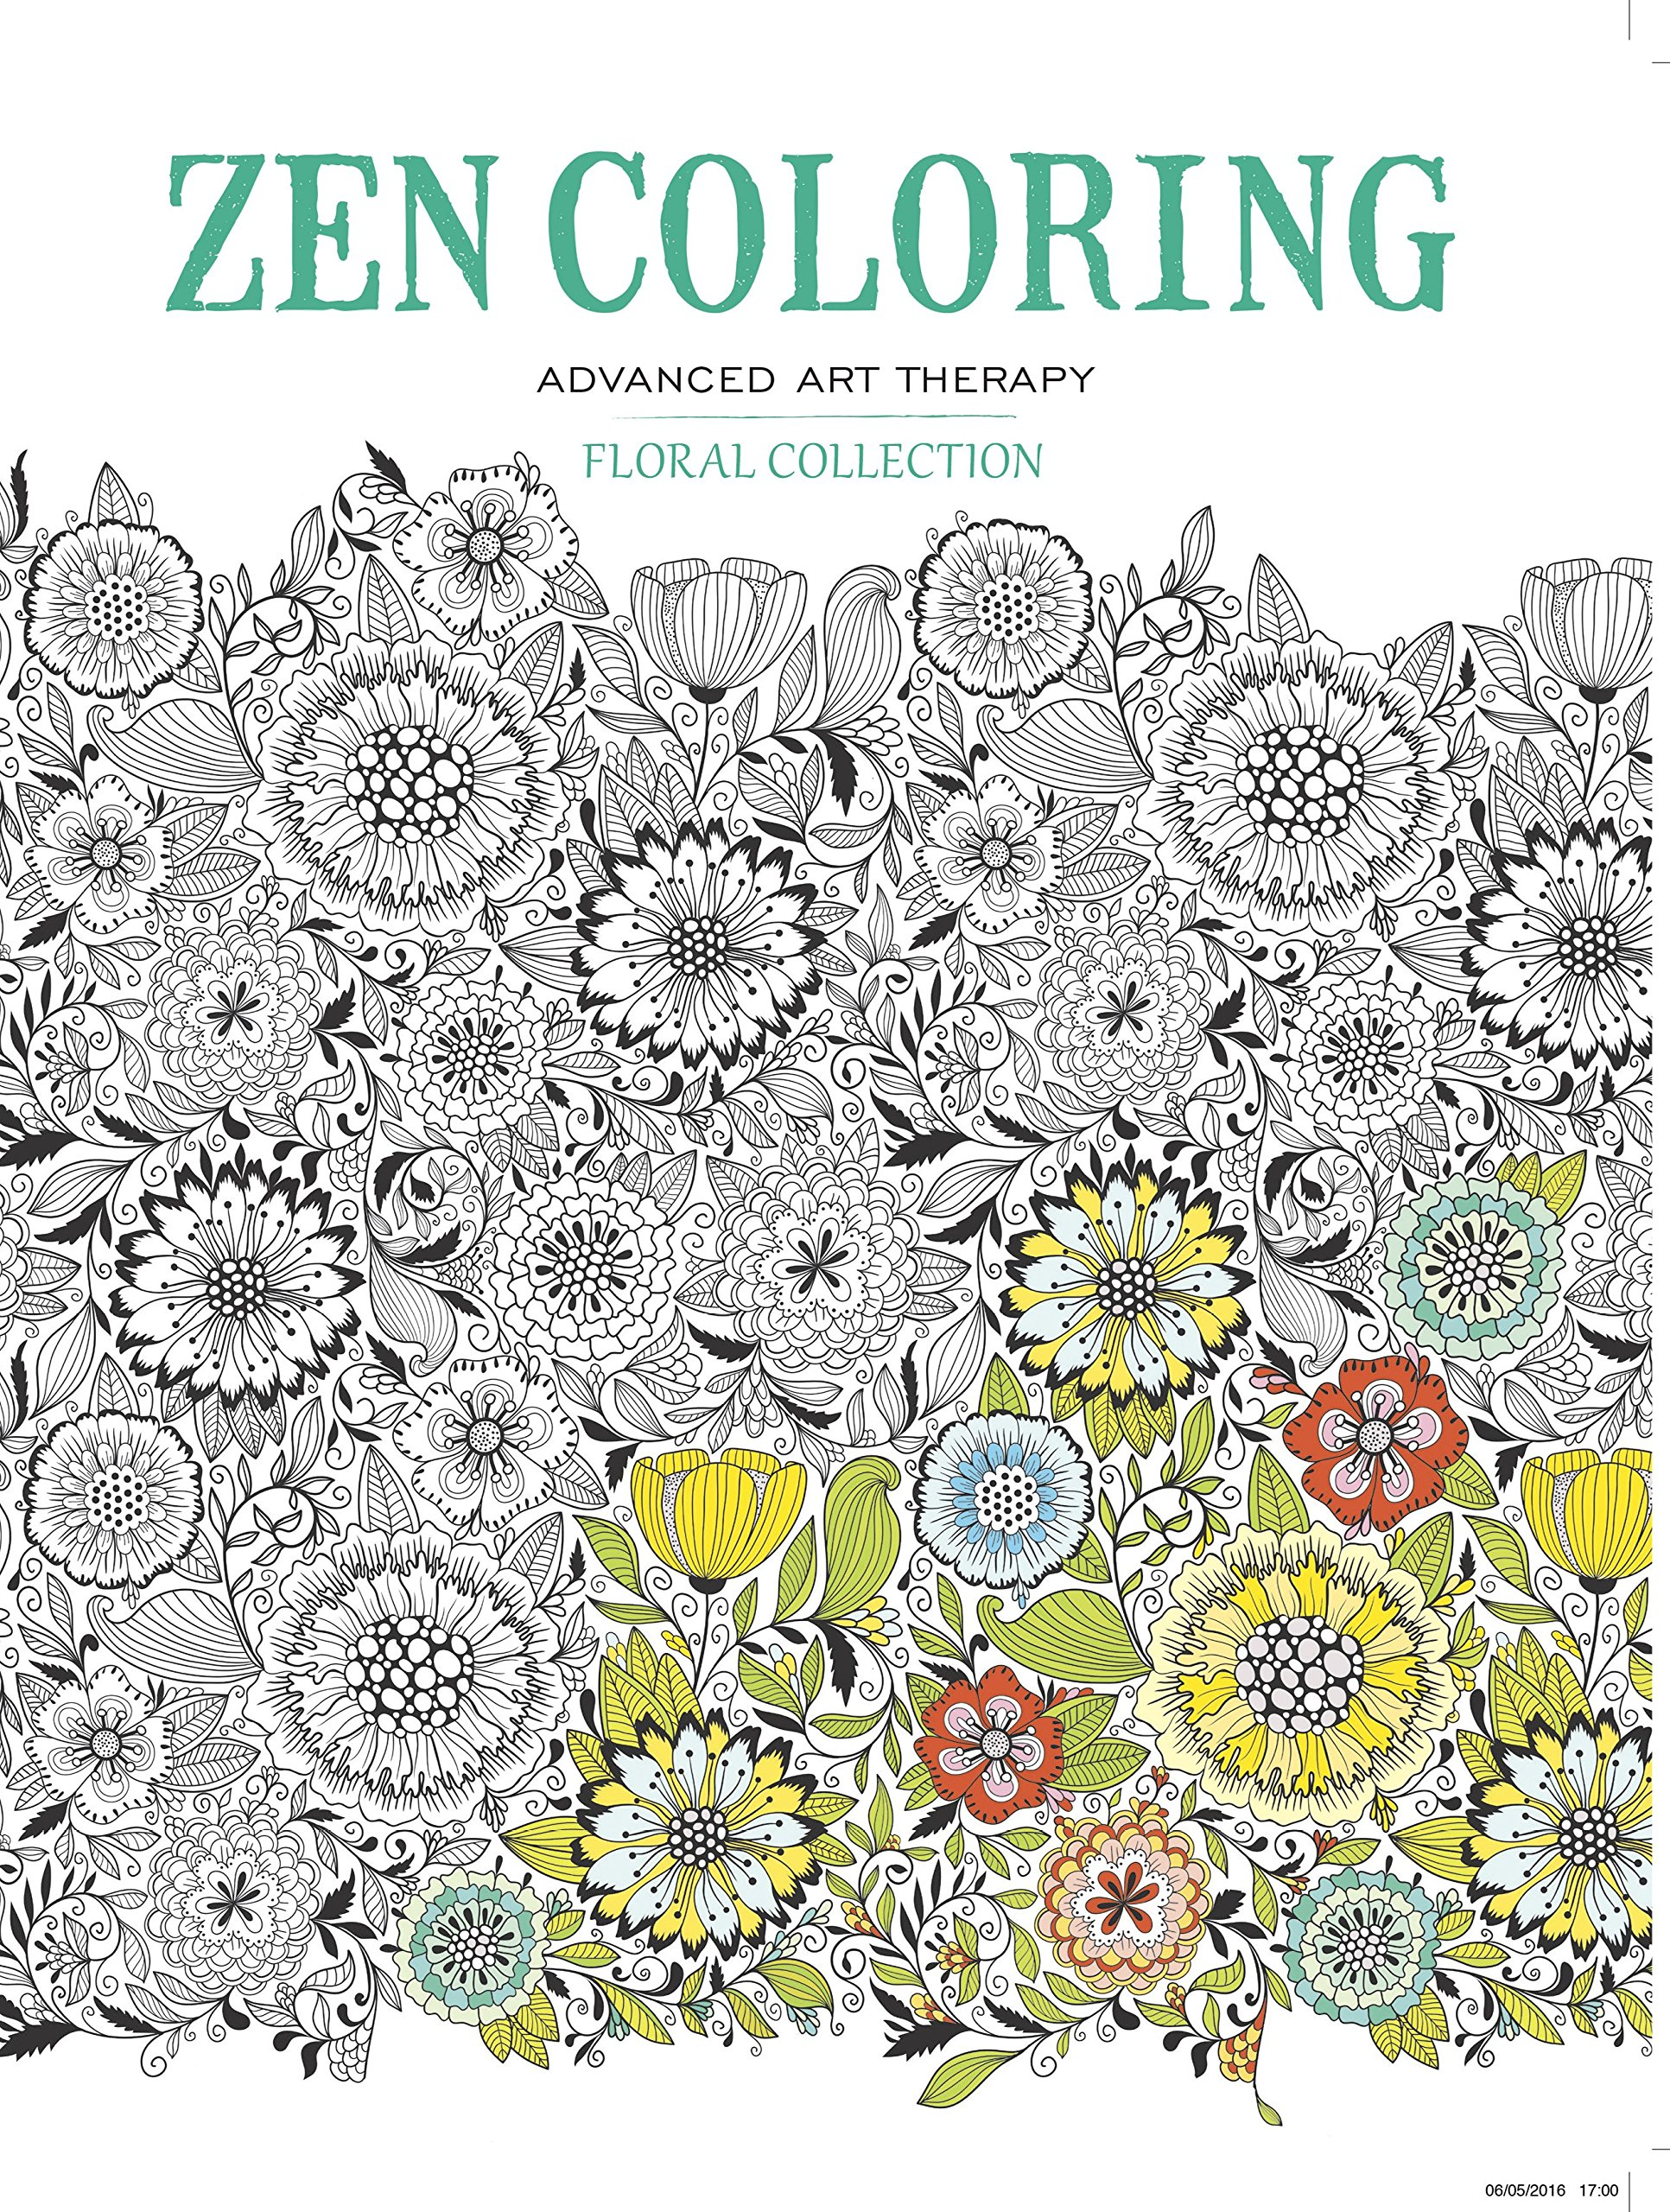 Zen colouring advanced art therapy collector edition - Amazon Com Zen Coloring Floral Collection Zen Coloring Advanced Art Therapy 0499991654772 Gmc Editors Books